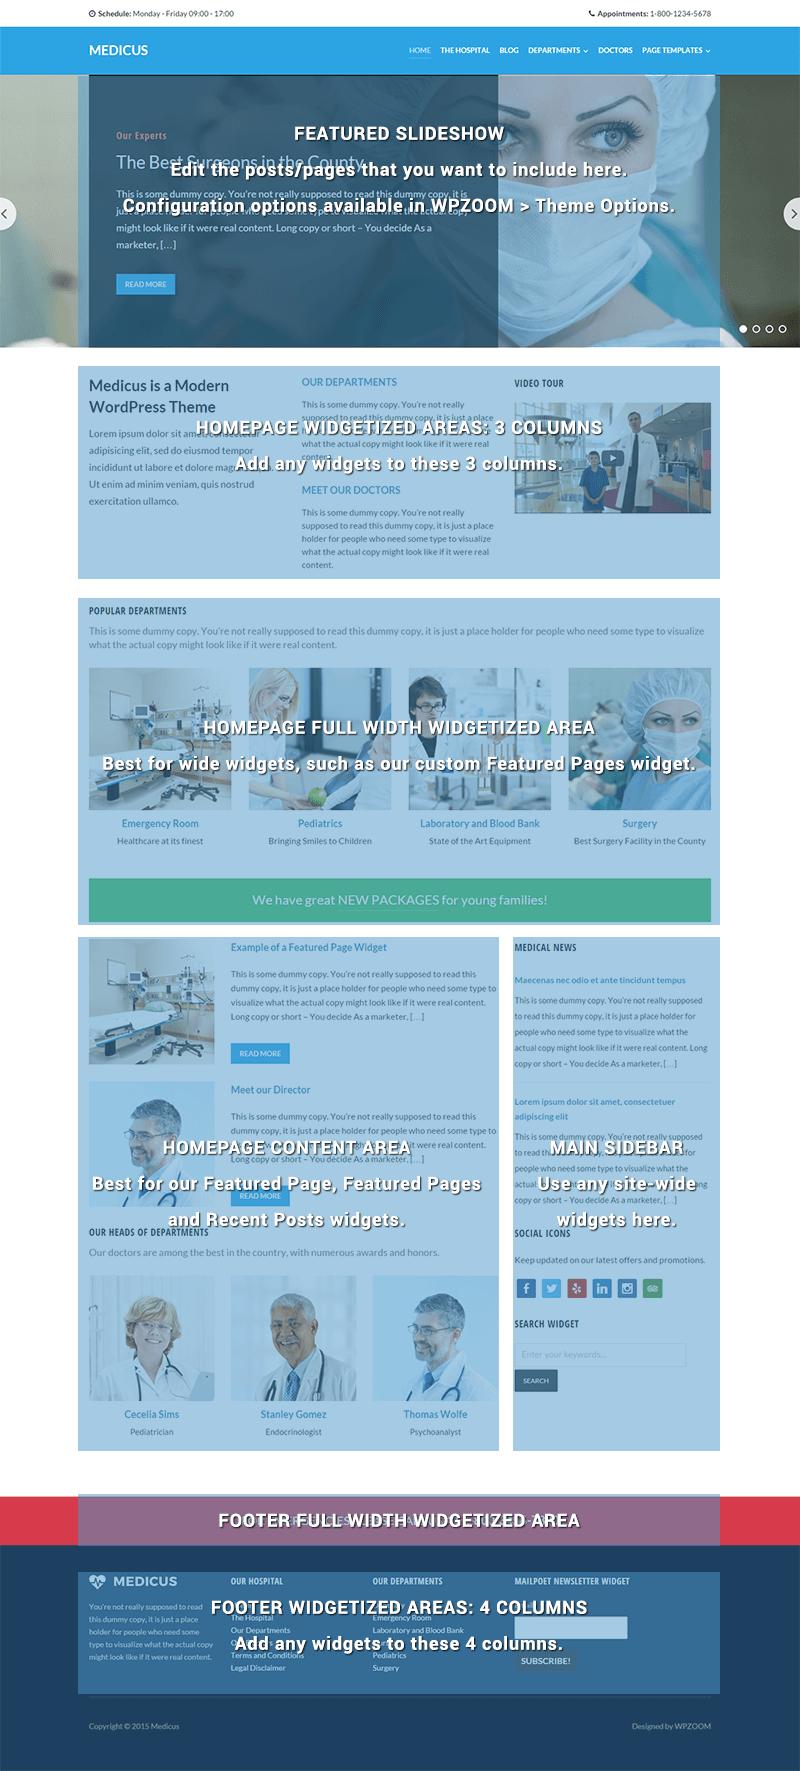 Medicus Theme Guide